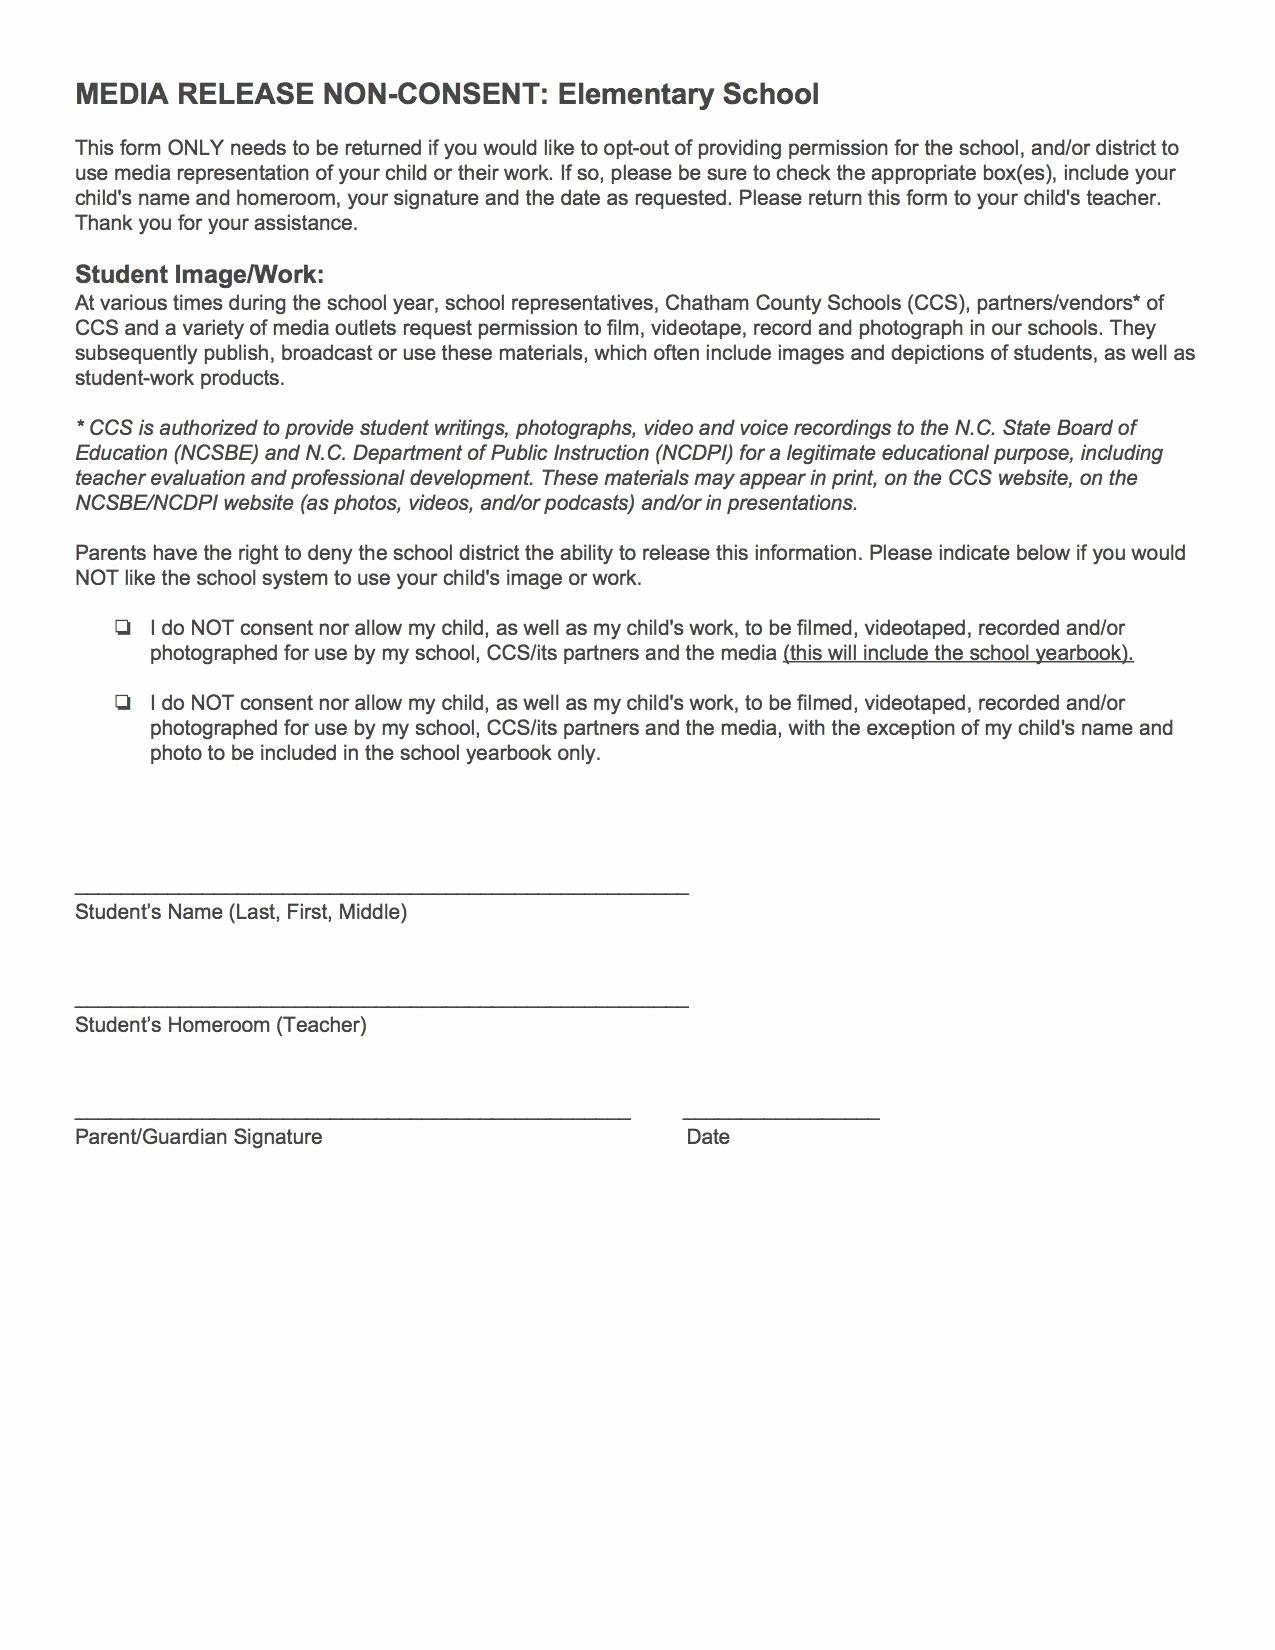 School Media Release form Luxury Parents Media Participation